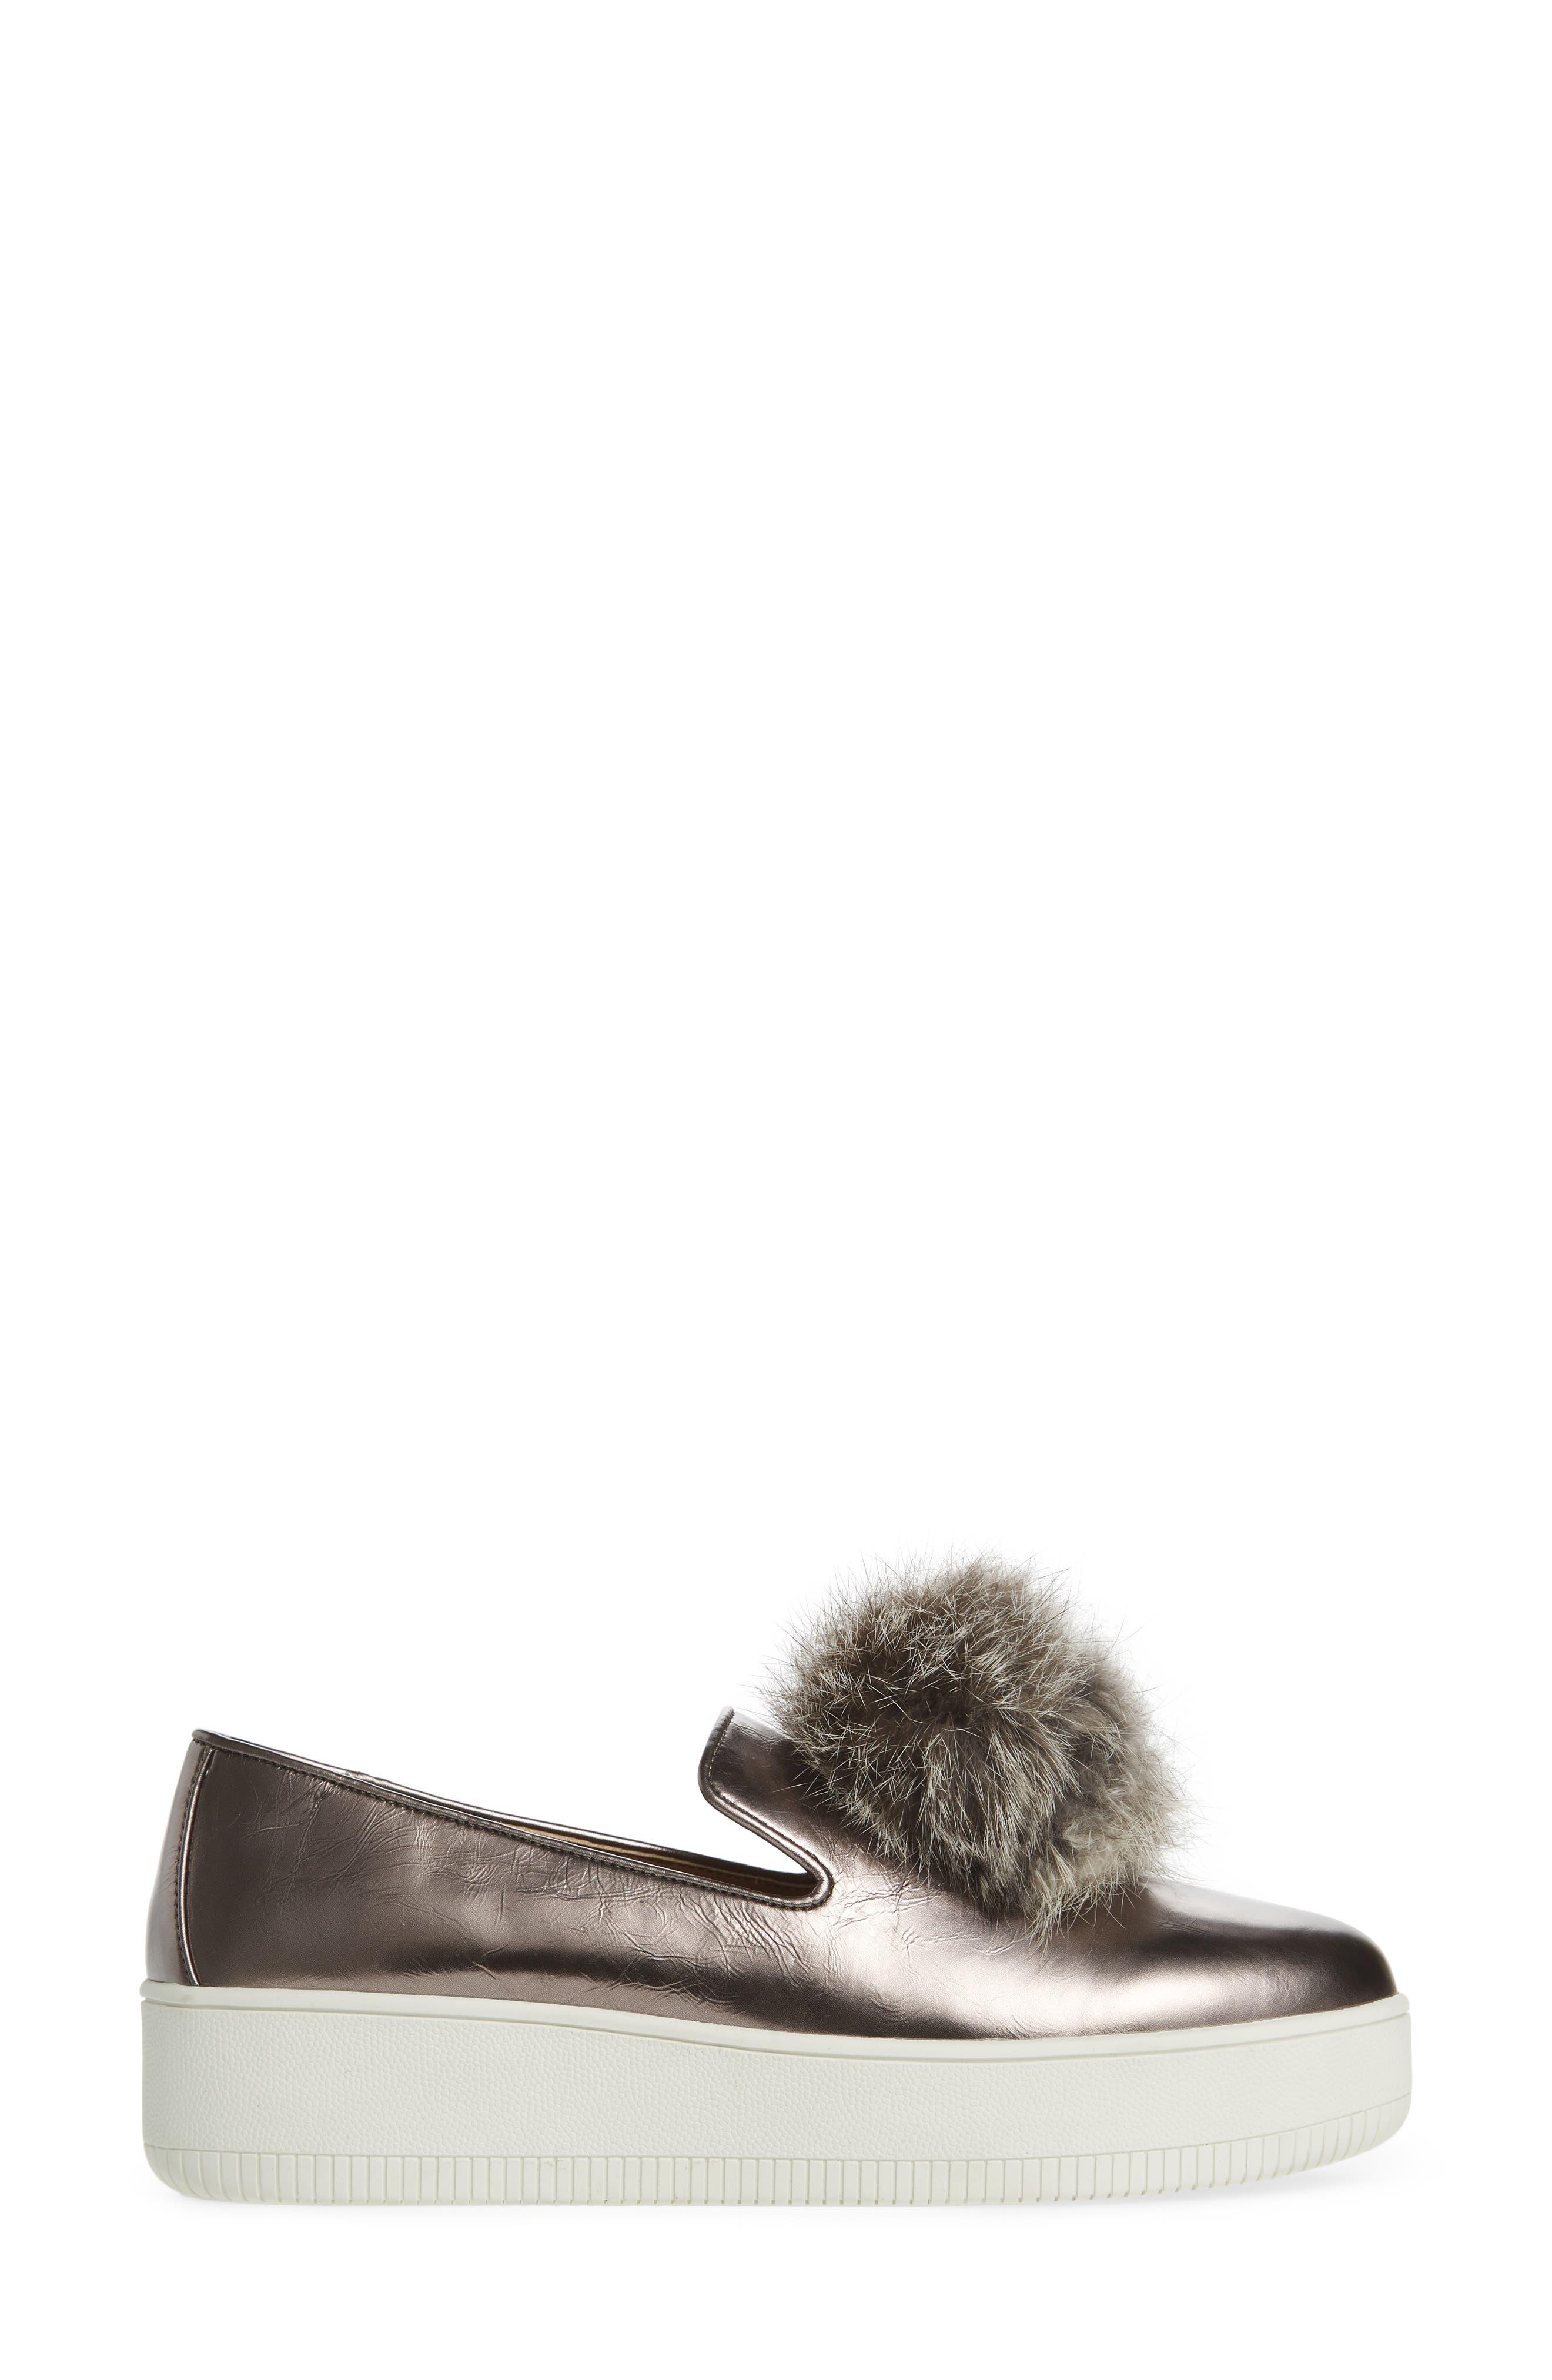 Alternate Image 3  - Linea Paolo Sammy Platform Sneaker with Genuine Rabbit Fur Pompom (Women)